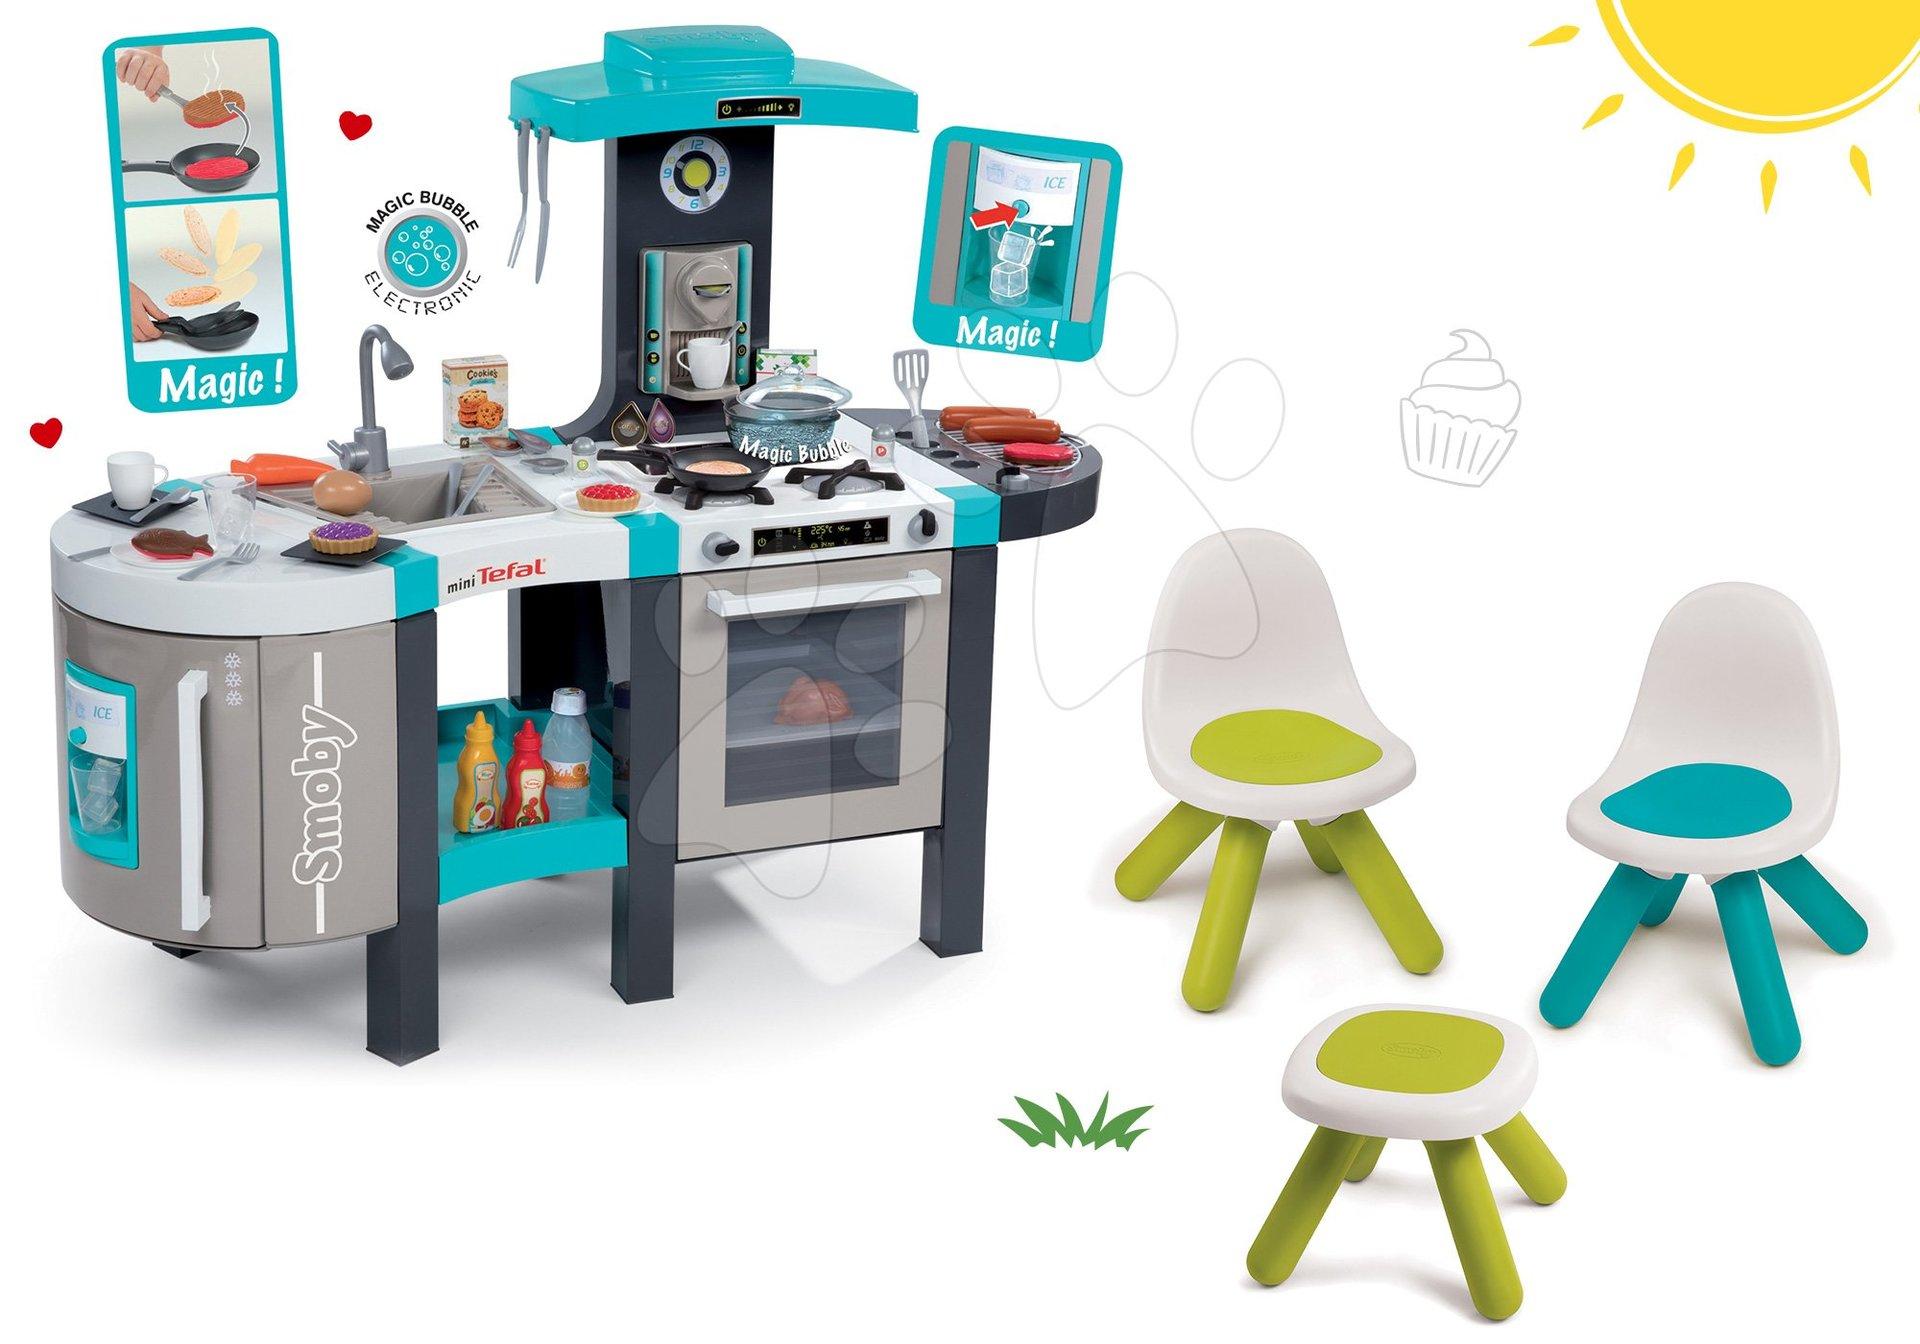 Kuchynky pre deti sety - Set kuchynka Tefal French Touch Smoby s ľadom a kávovarom a stôl Piknik s dvoma stoličkami KidChair Blue